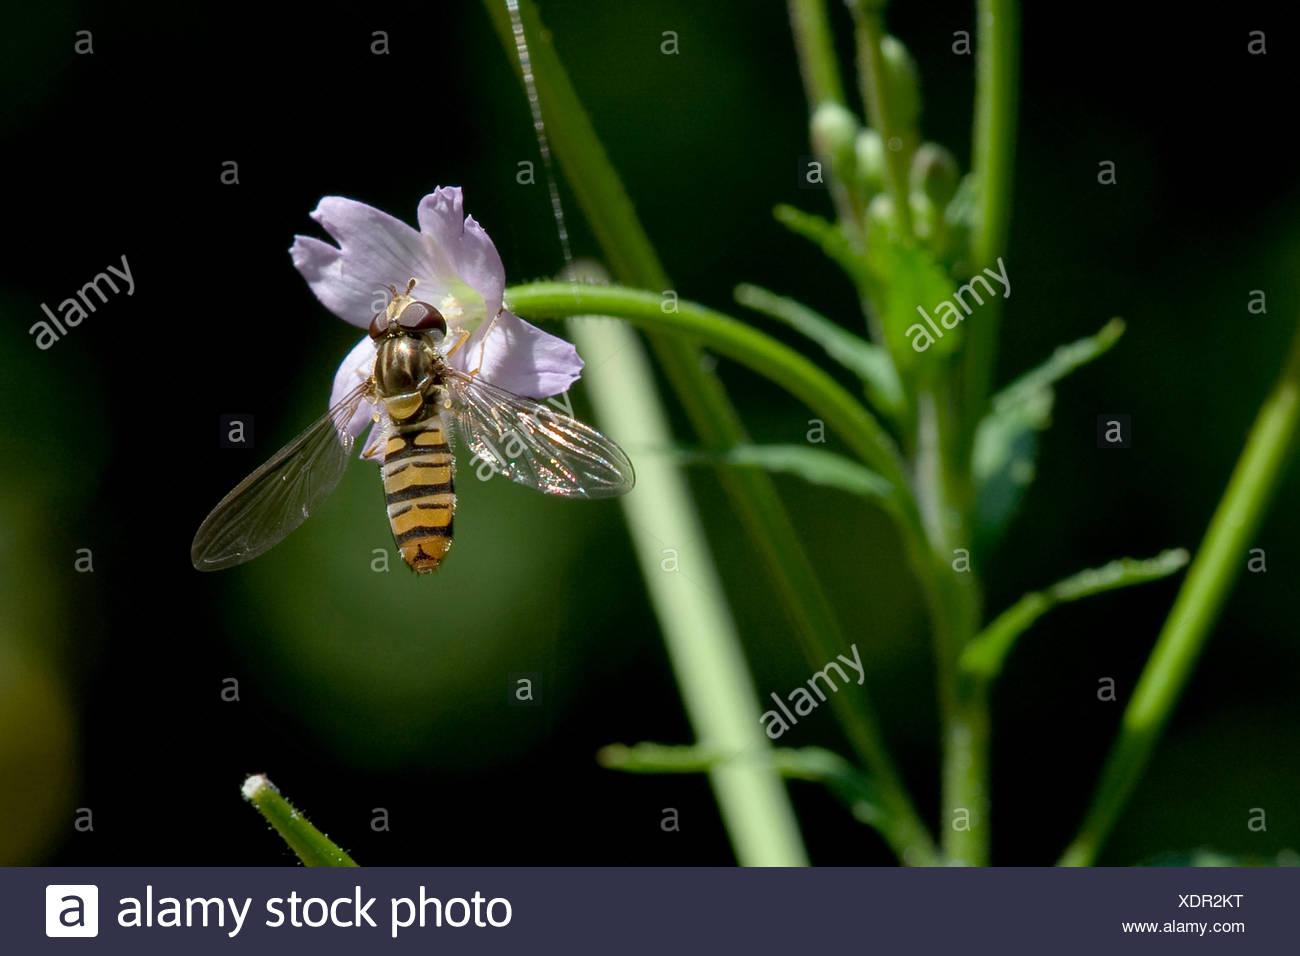 Hoary willow-herb, petite fleur de saule velu Epilobium parviflorum (herbe), fleur avec Episyrphus balteatus, Allemagne Photo Stock